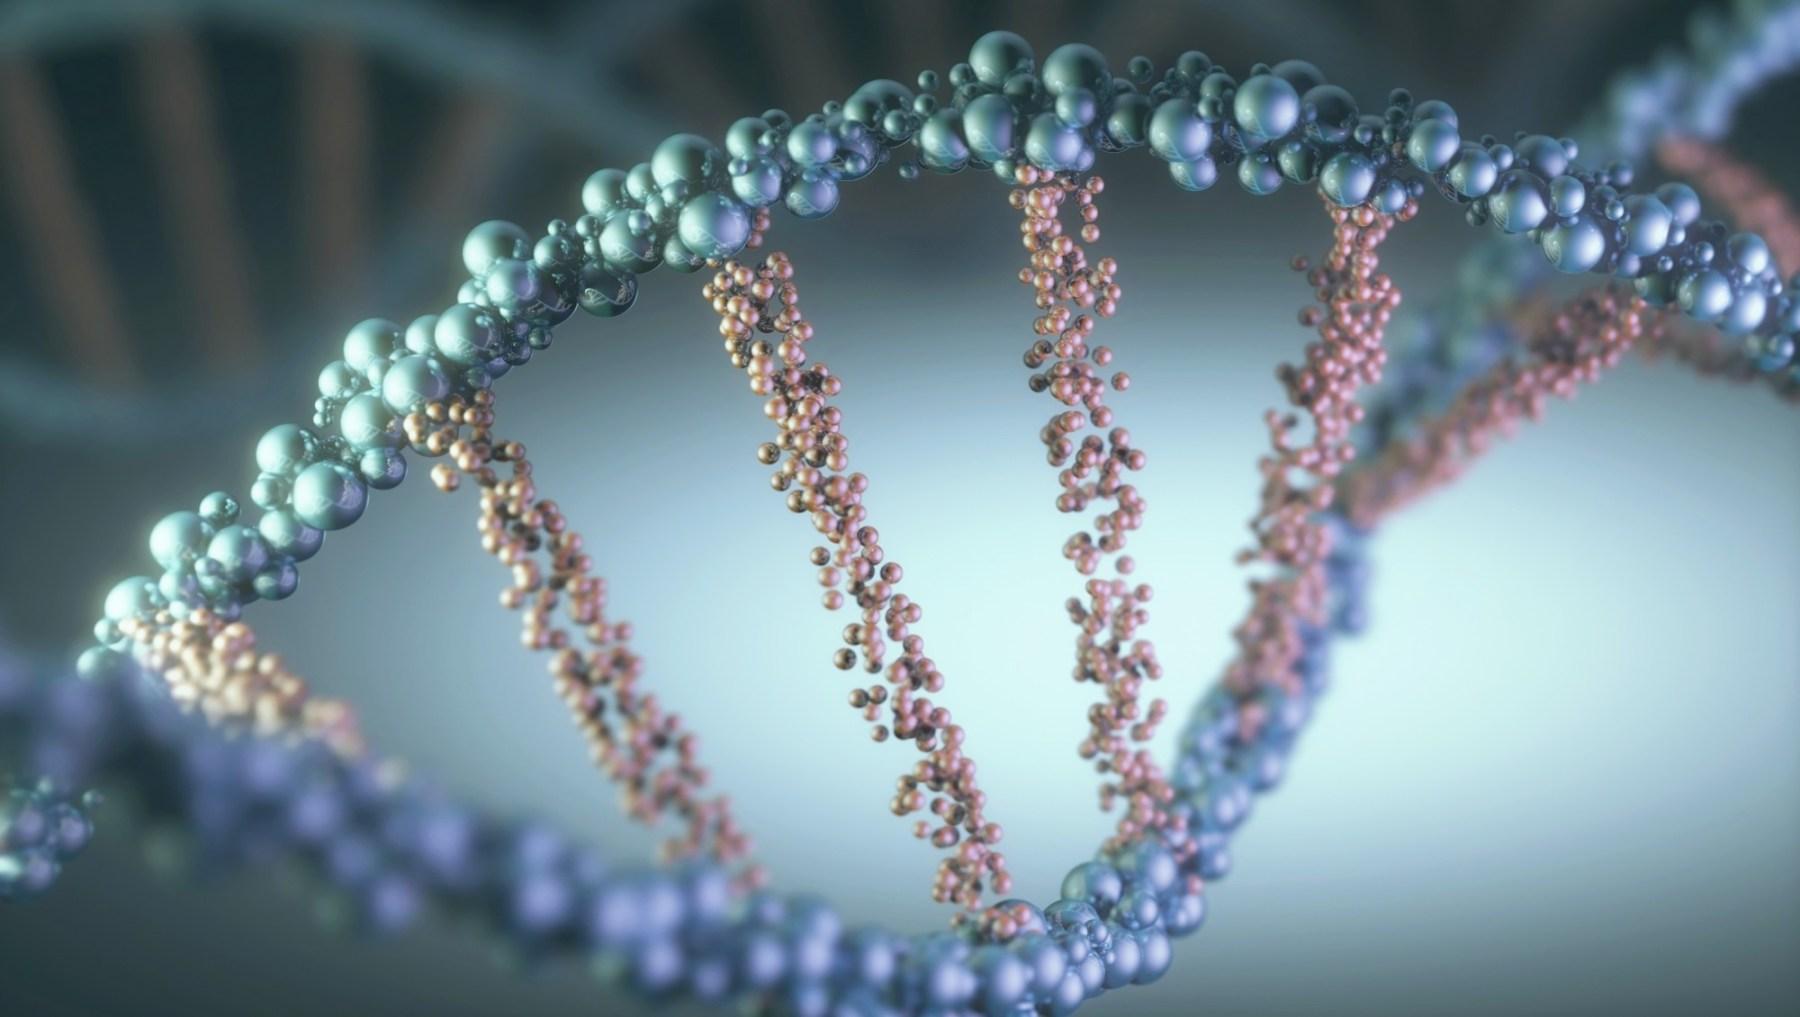 Dna (deoxyribonucleic acid) helix, illustration.